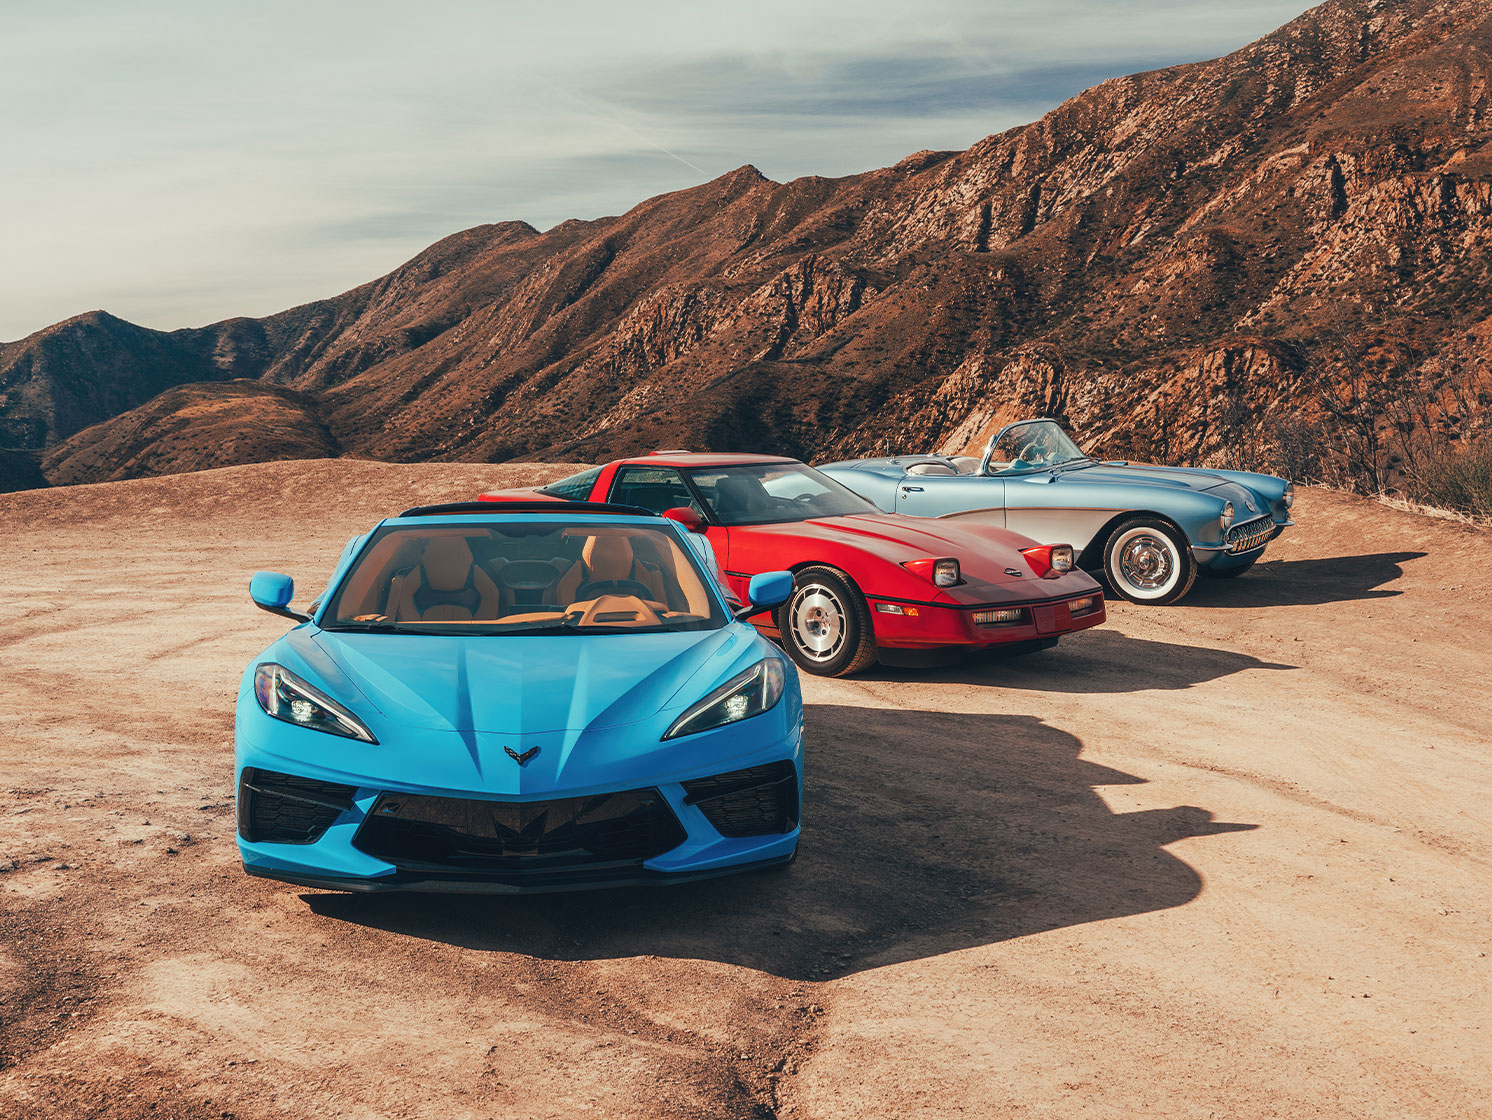 The engine moves back, the Corvette moves forward